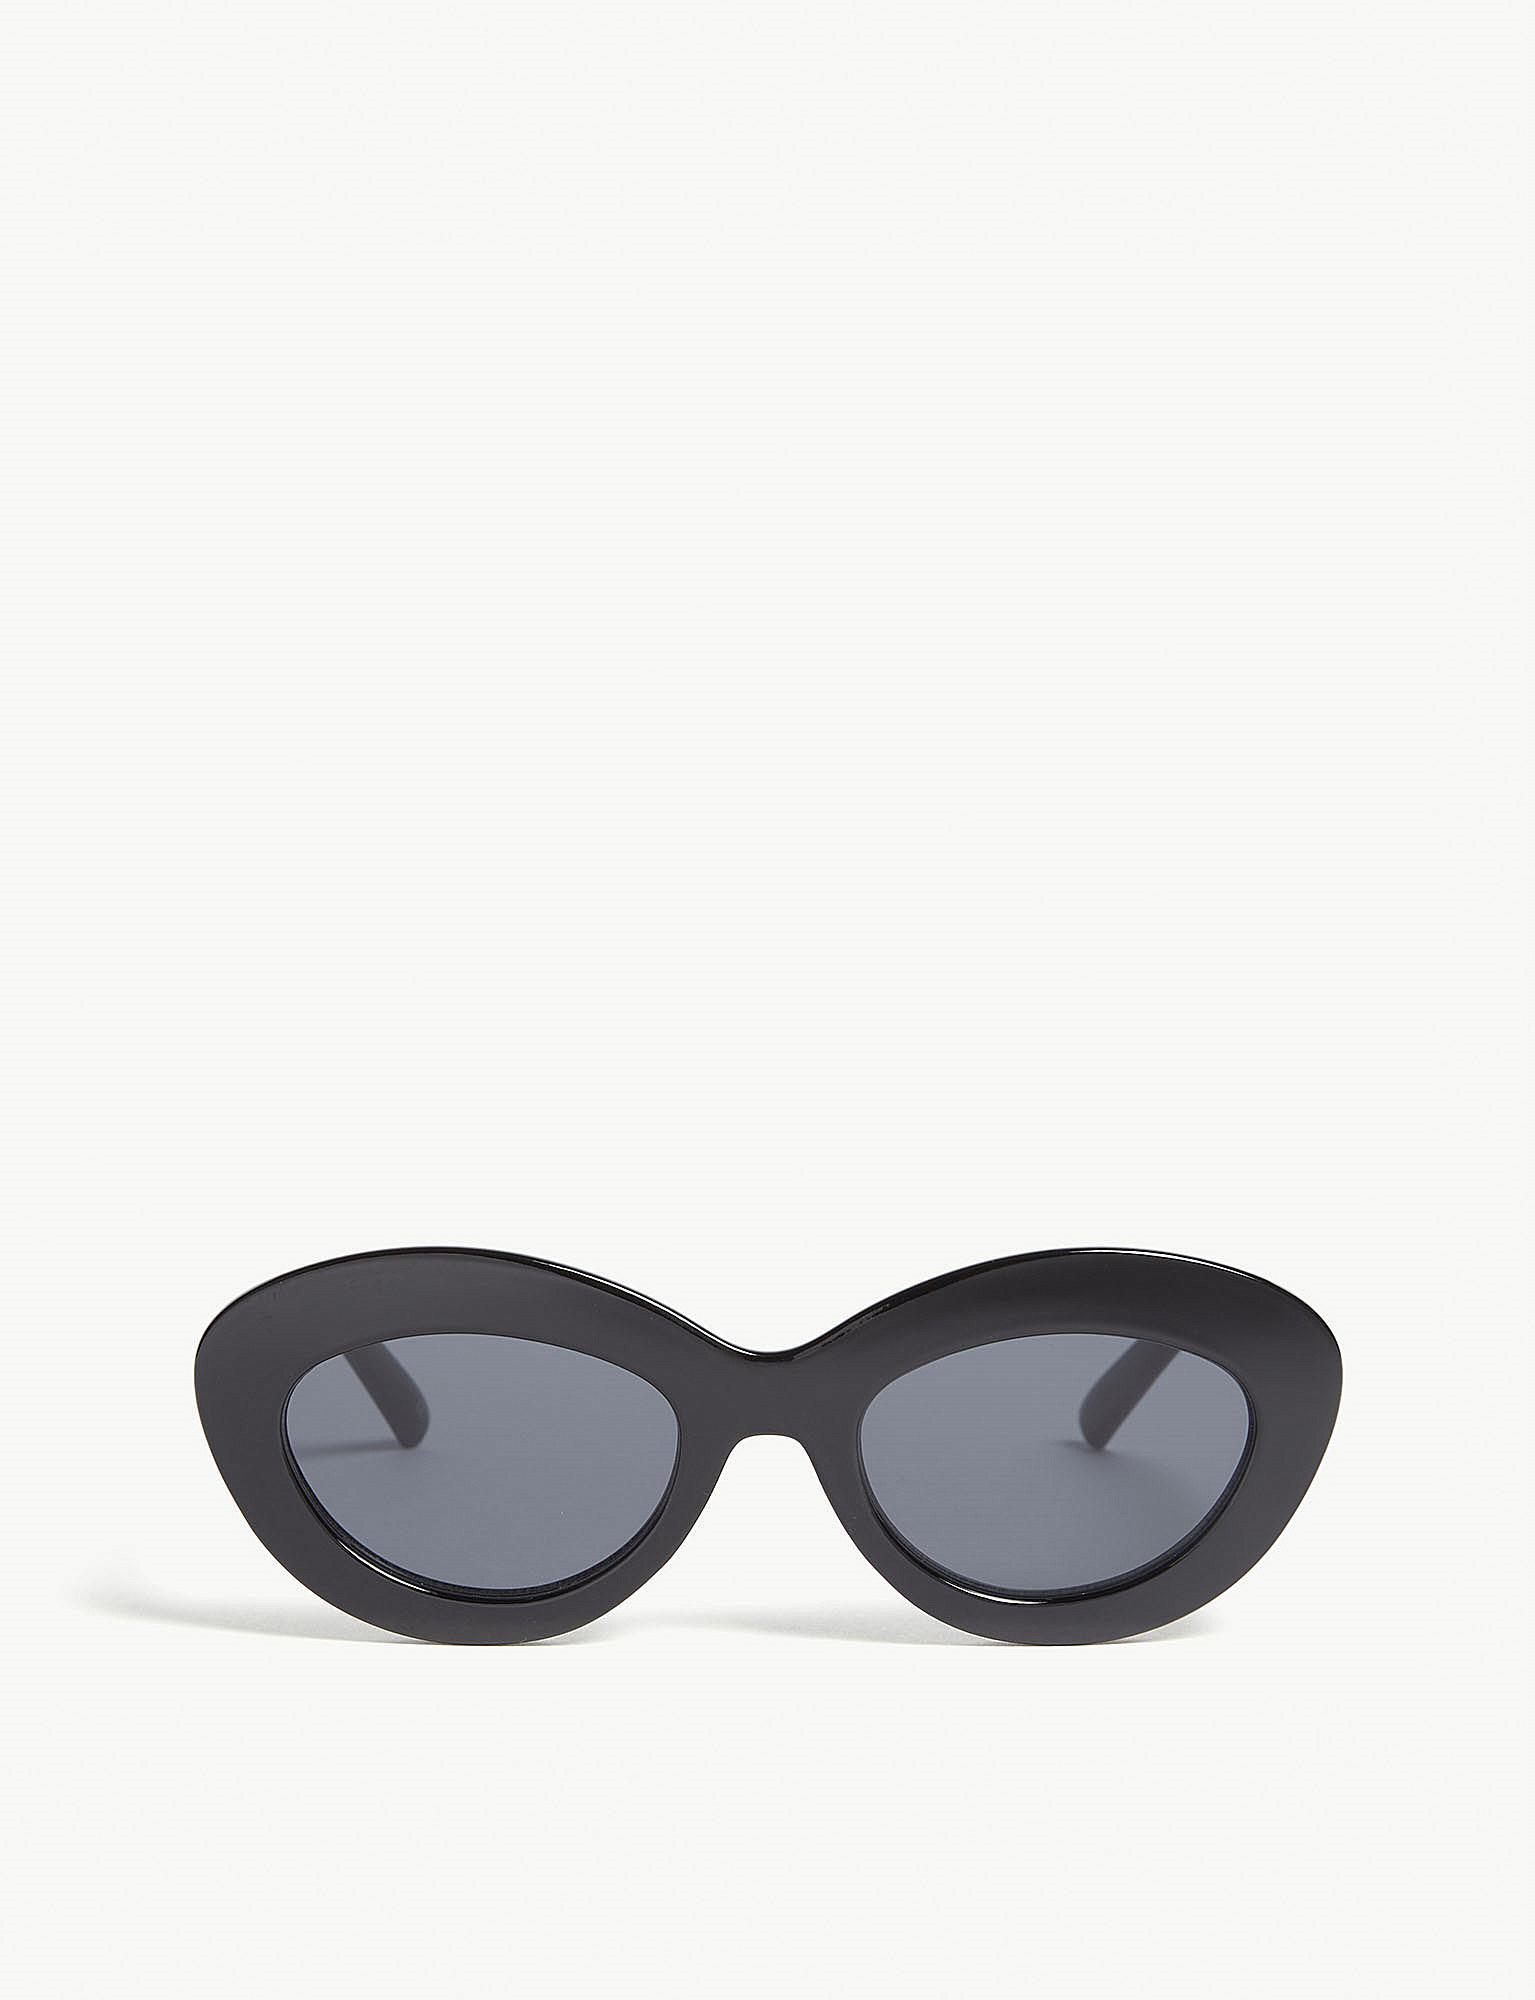 ced7db8d8fa Le Specs Fluxus Cat-eye Sunglasses in Black - Lyst